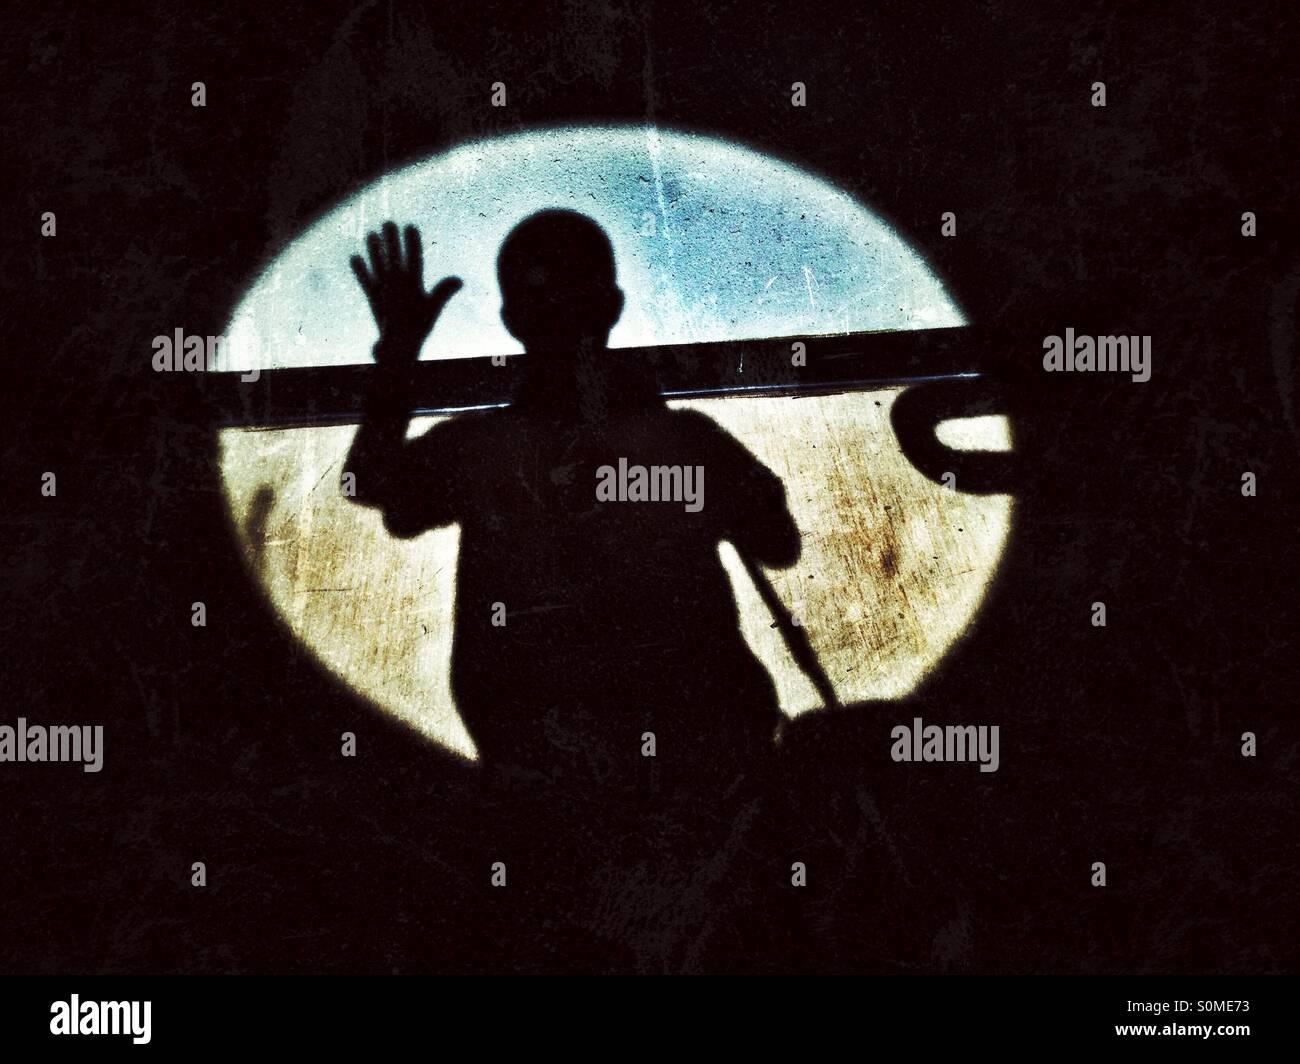 Shadow of a man waving. - Stock Image